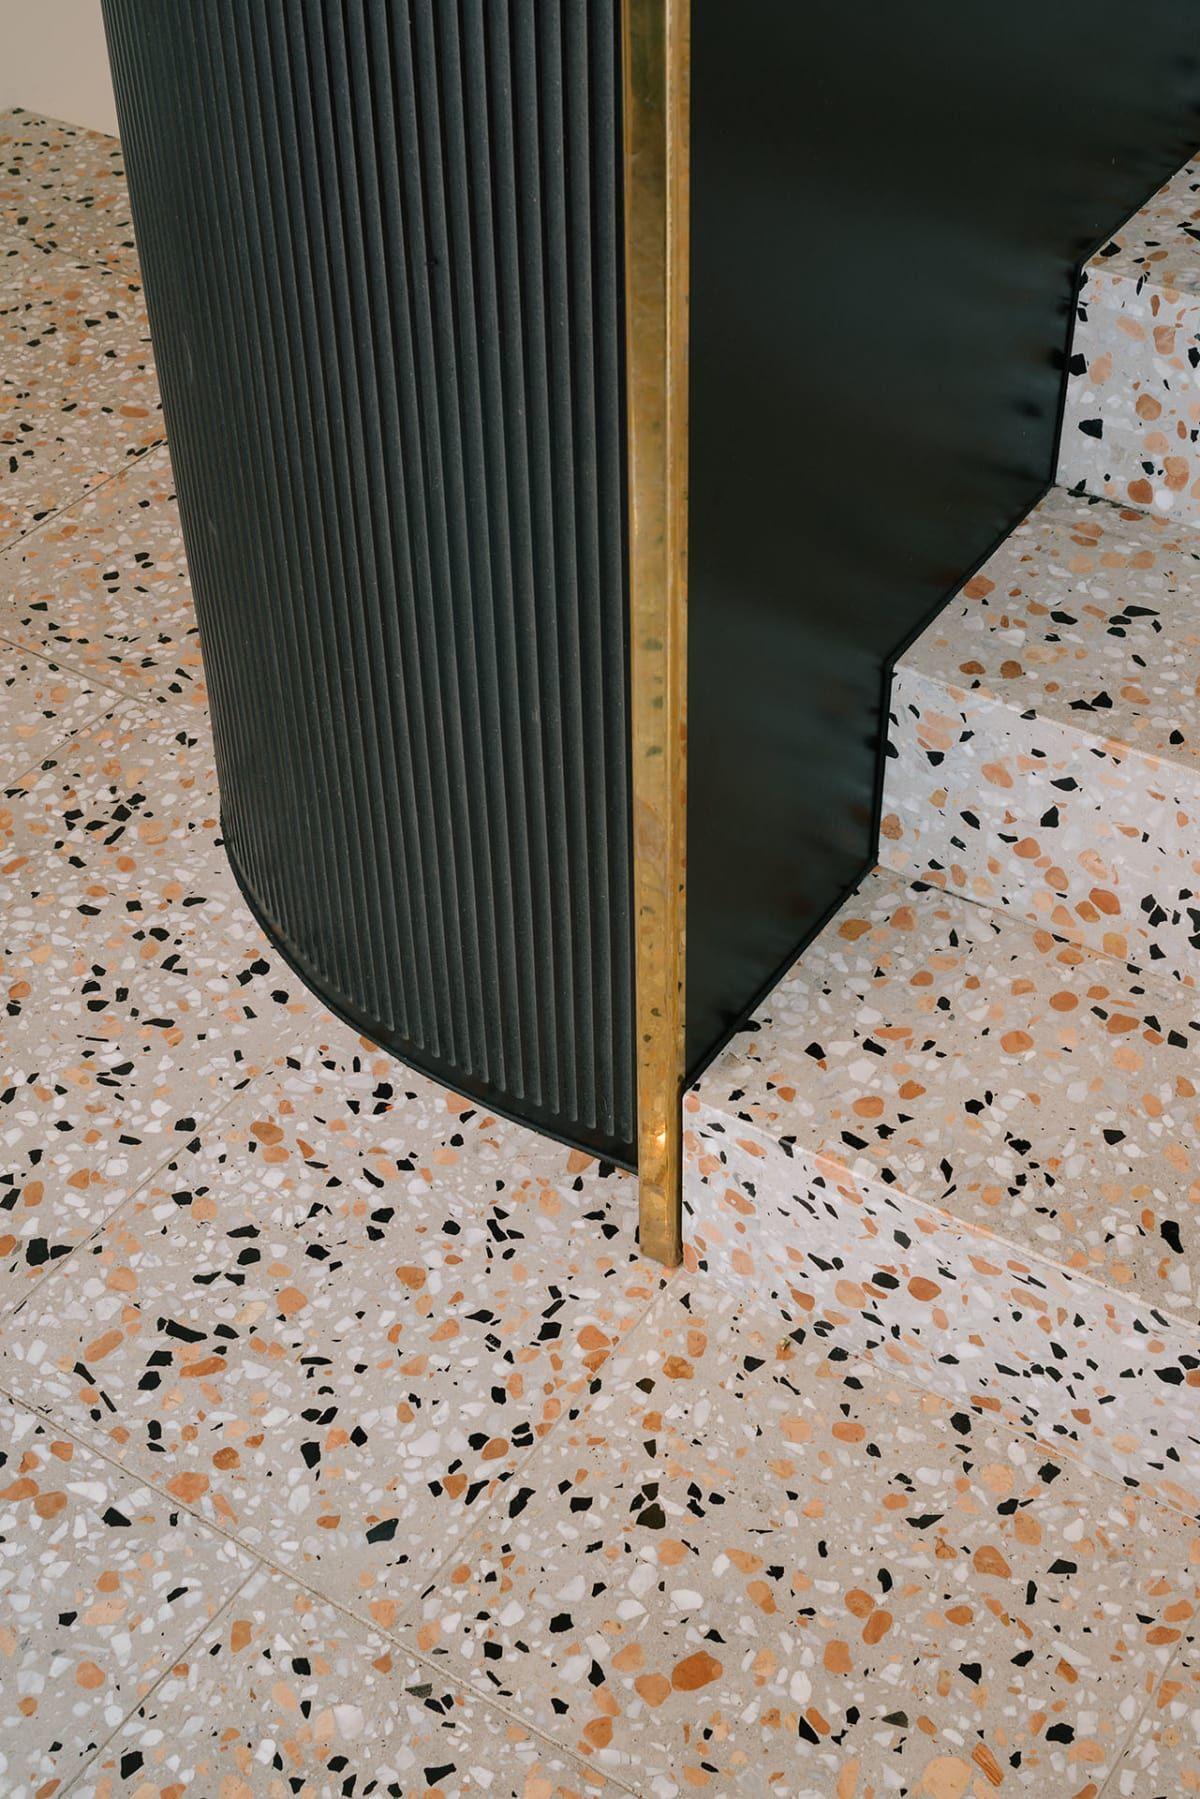 Terrazo Floor Combination Of Different Marbles Nomos Groupement D Architectes Terrazzo Terrazzo Tile Terrazo Flooring